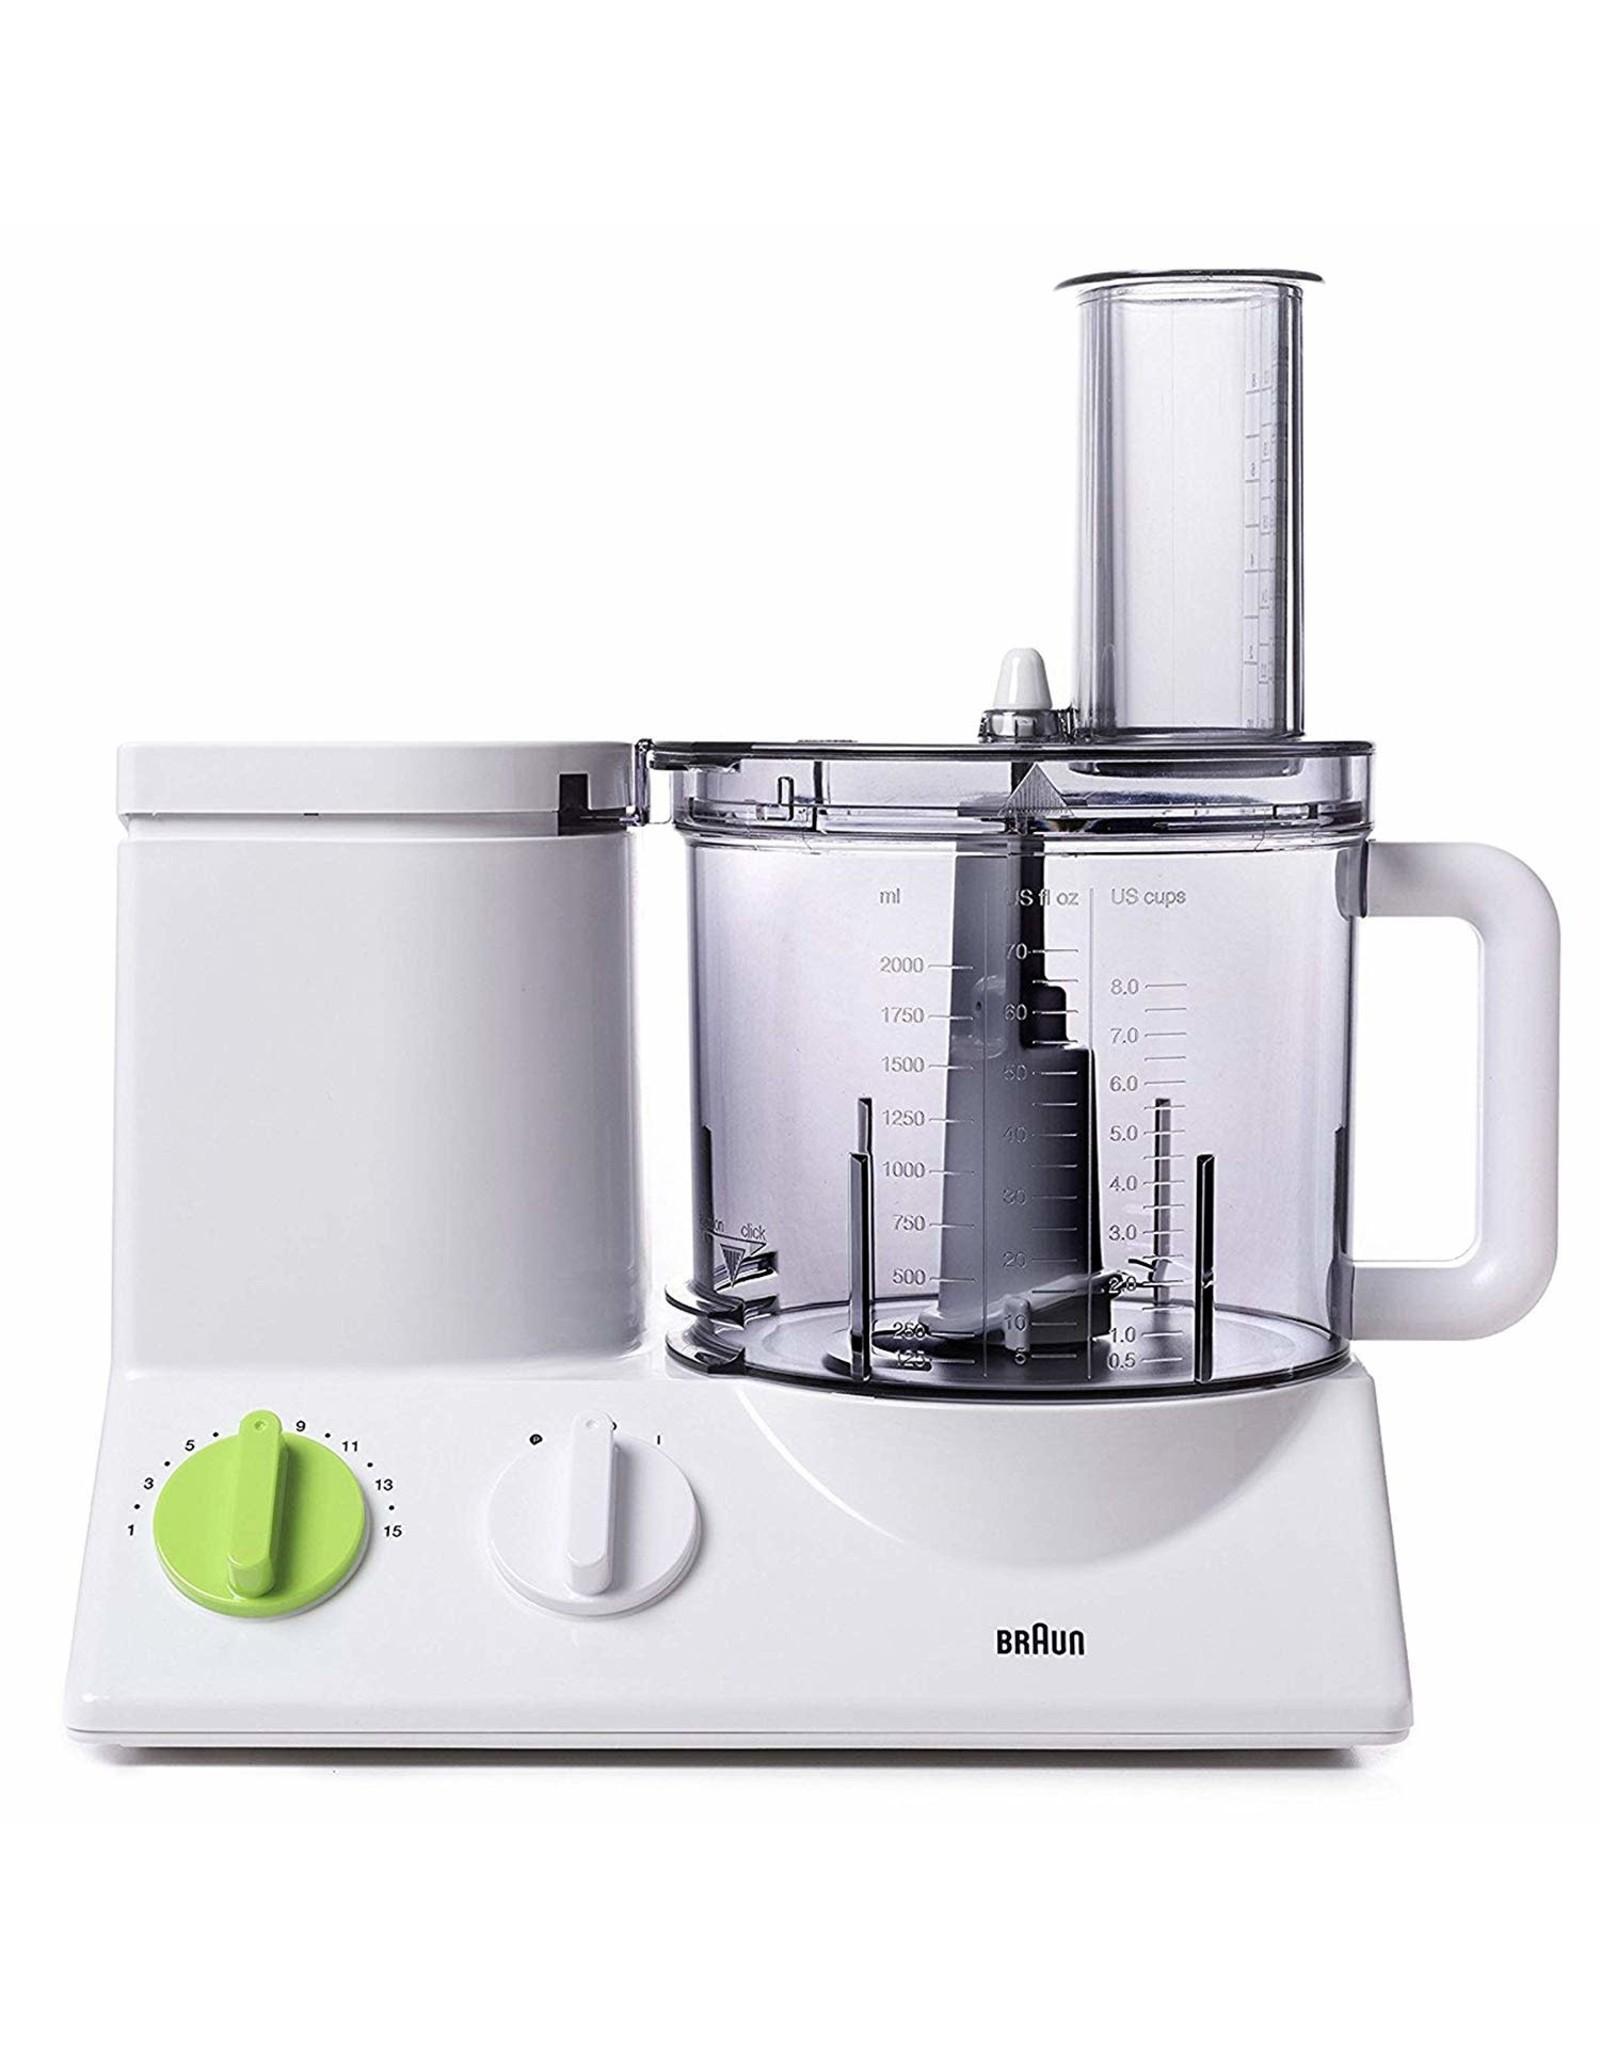 Braun Food Processor  FP3020